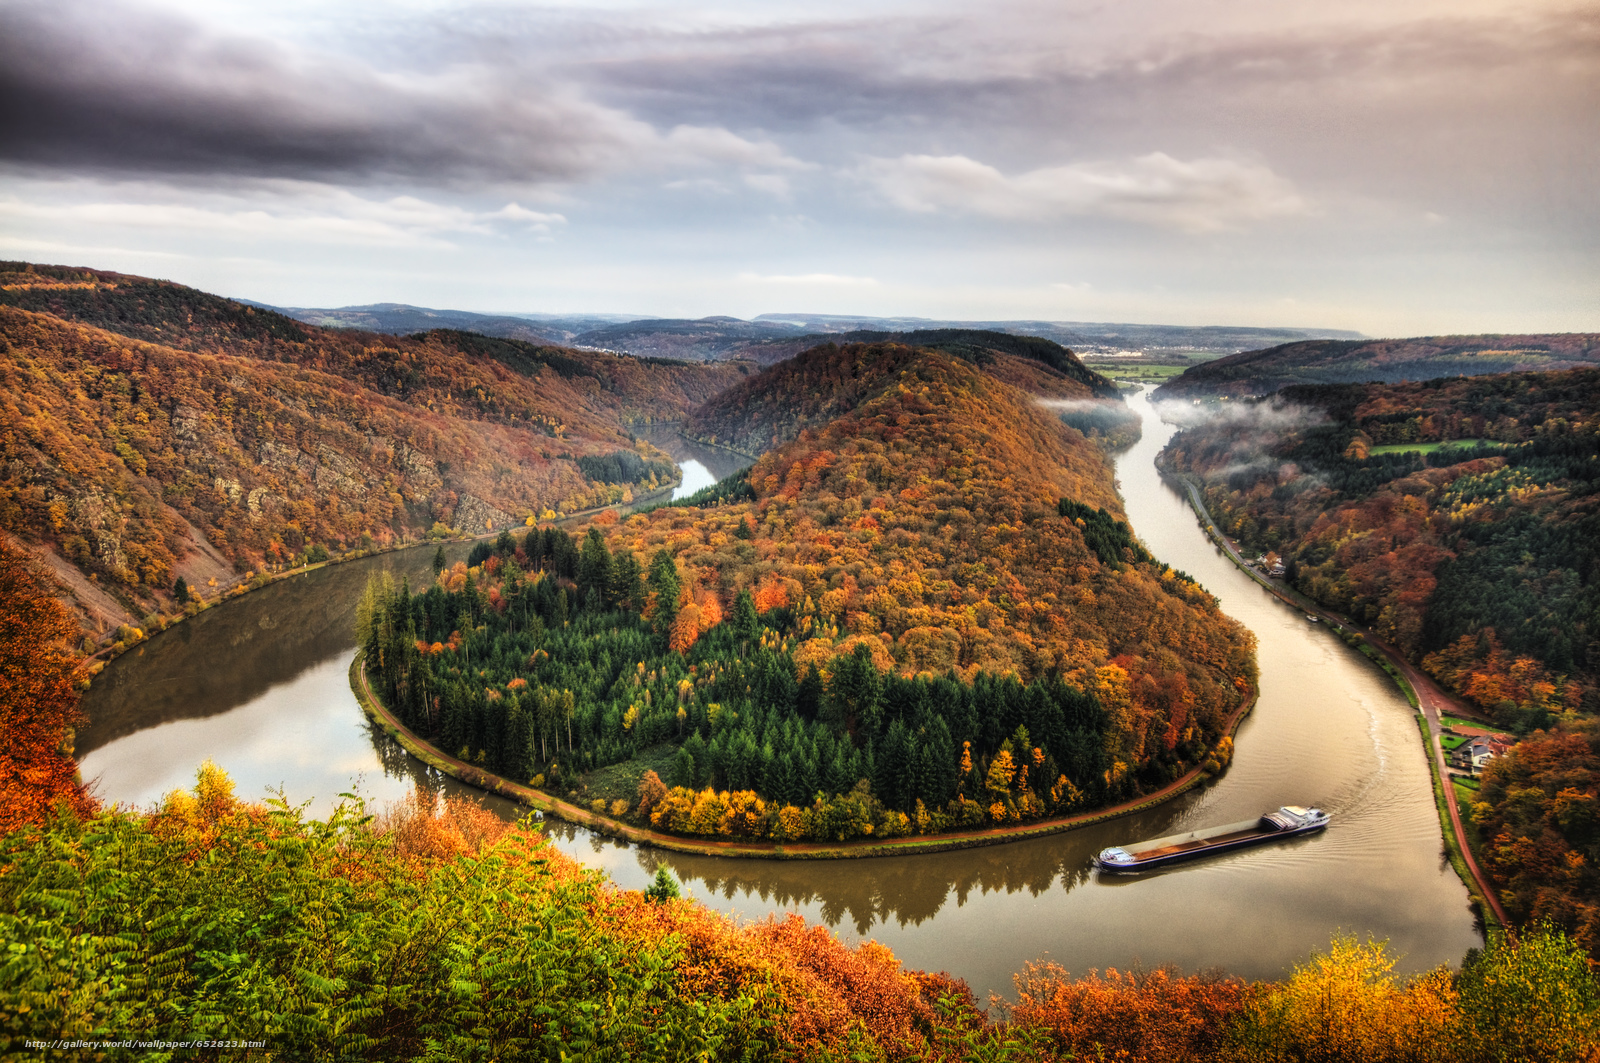 Download wallpaper Mettlach,  german,  Horseshoe Bend,  Bend of the river free desktop wallpaper in the resolution 4288x2848 — picture №652823